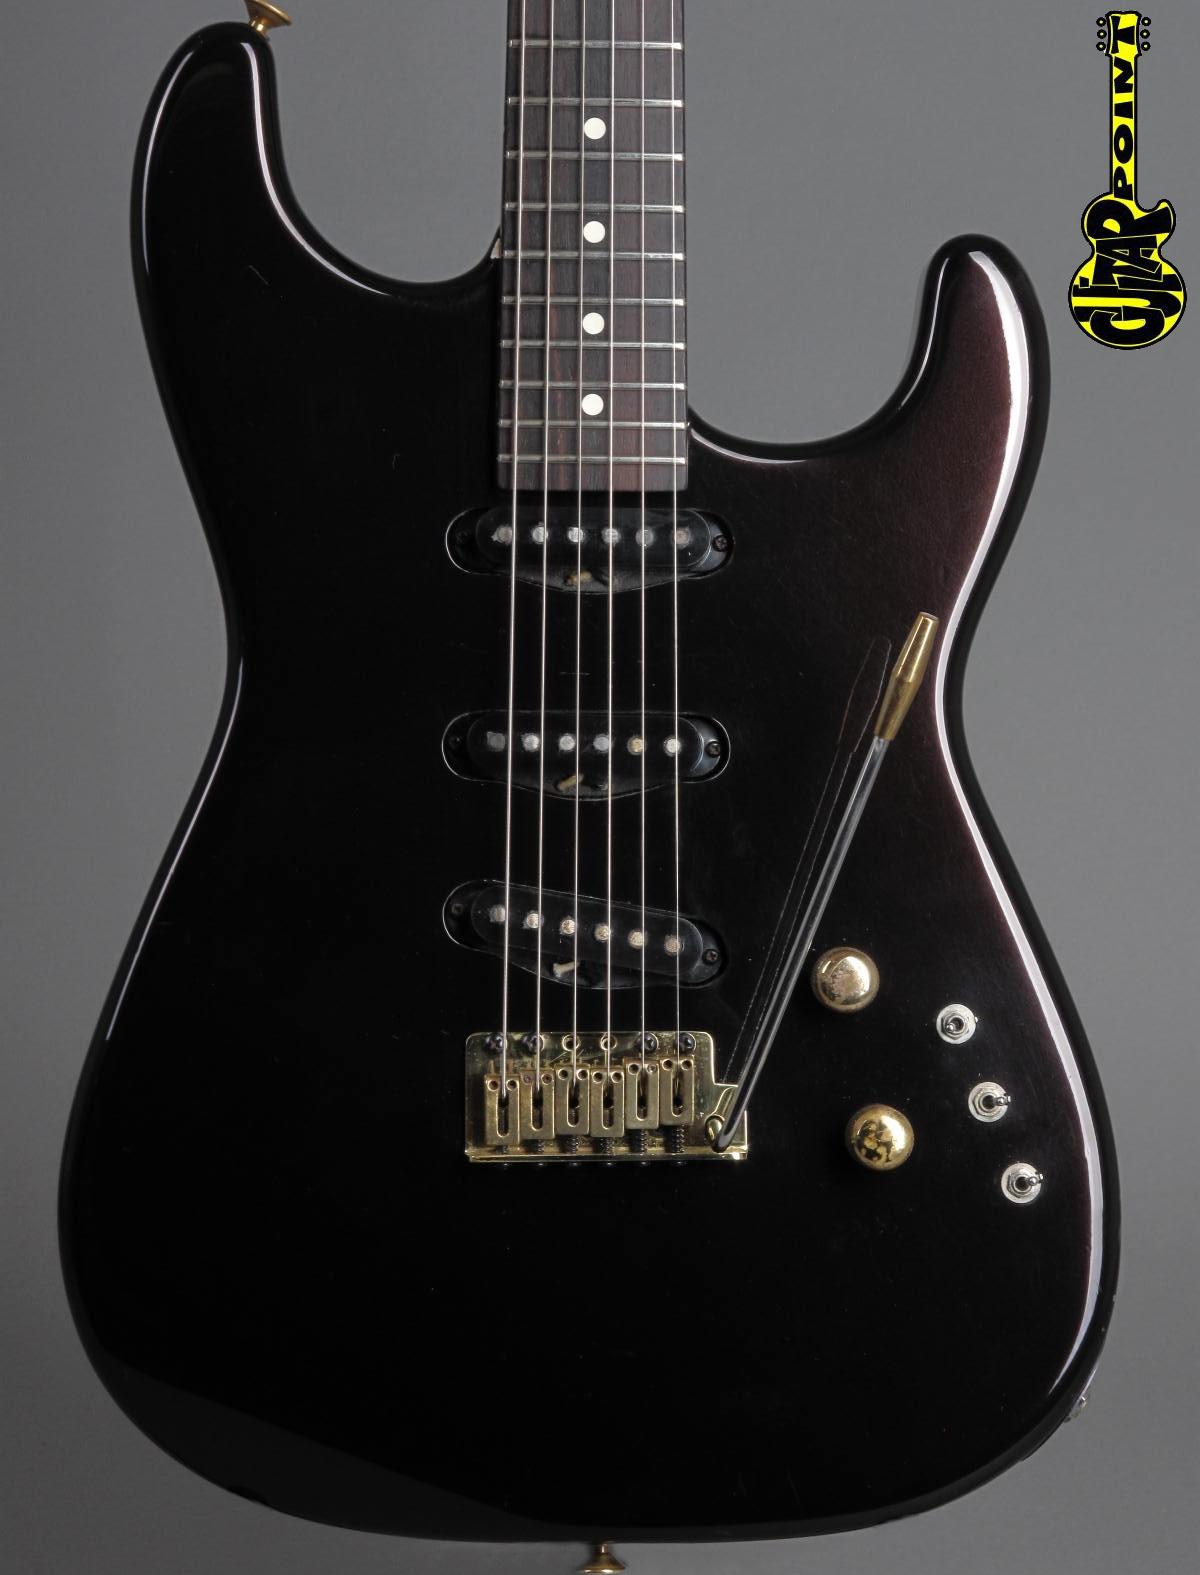 1983 Charvel San Dimas Strat - Burgundy Metallic